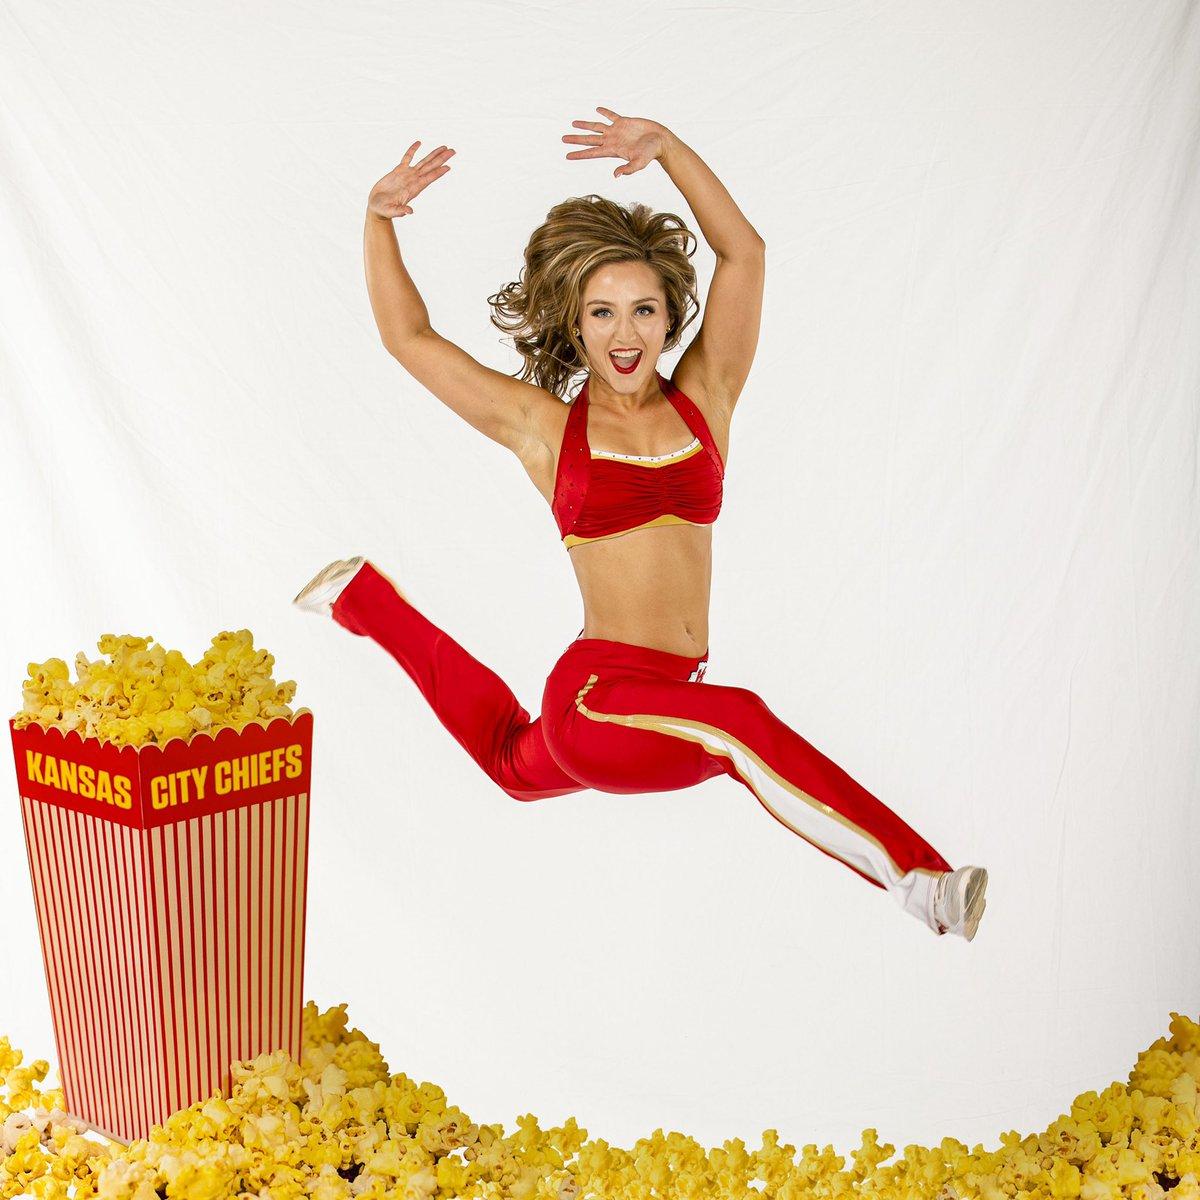 Get your popcorn ready for Sunday! #NationalPopcornDay